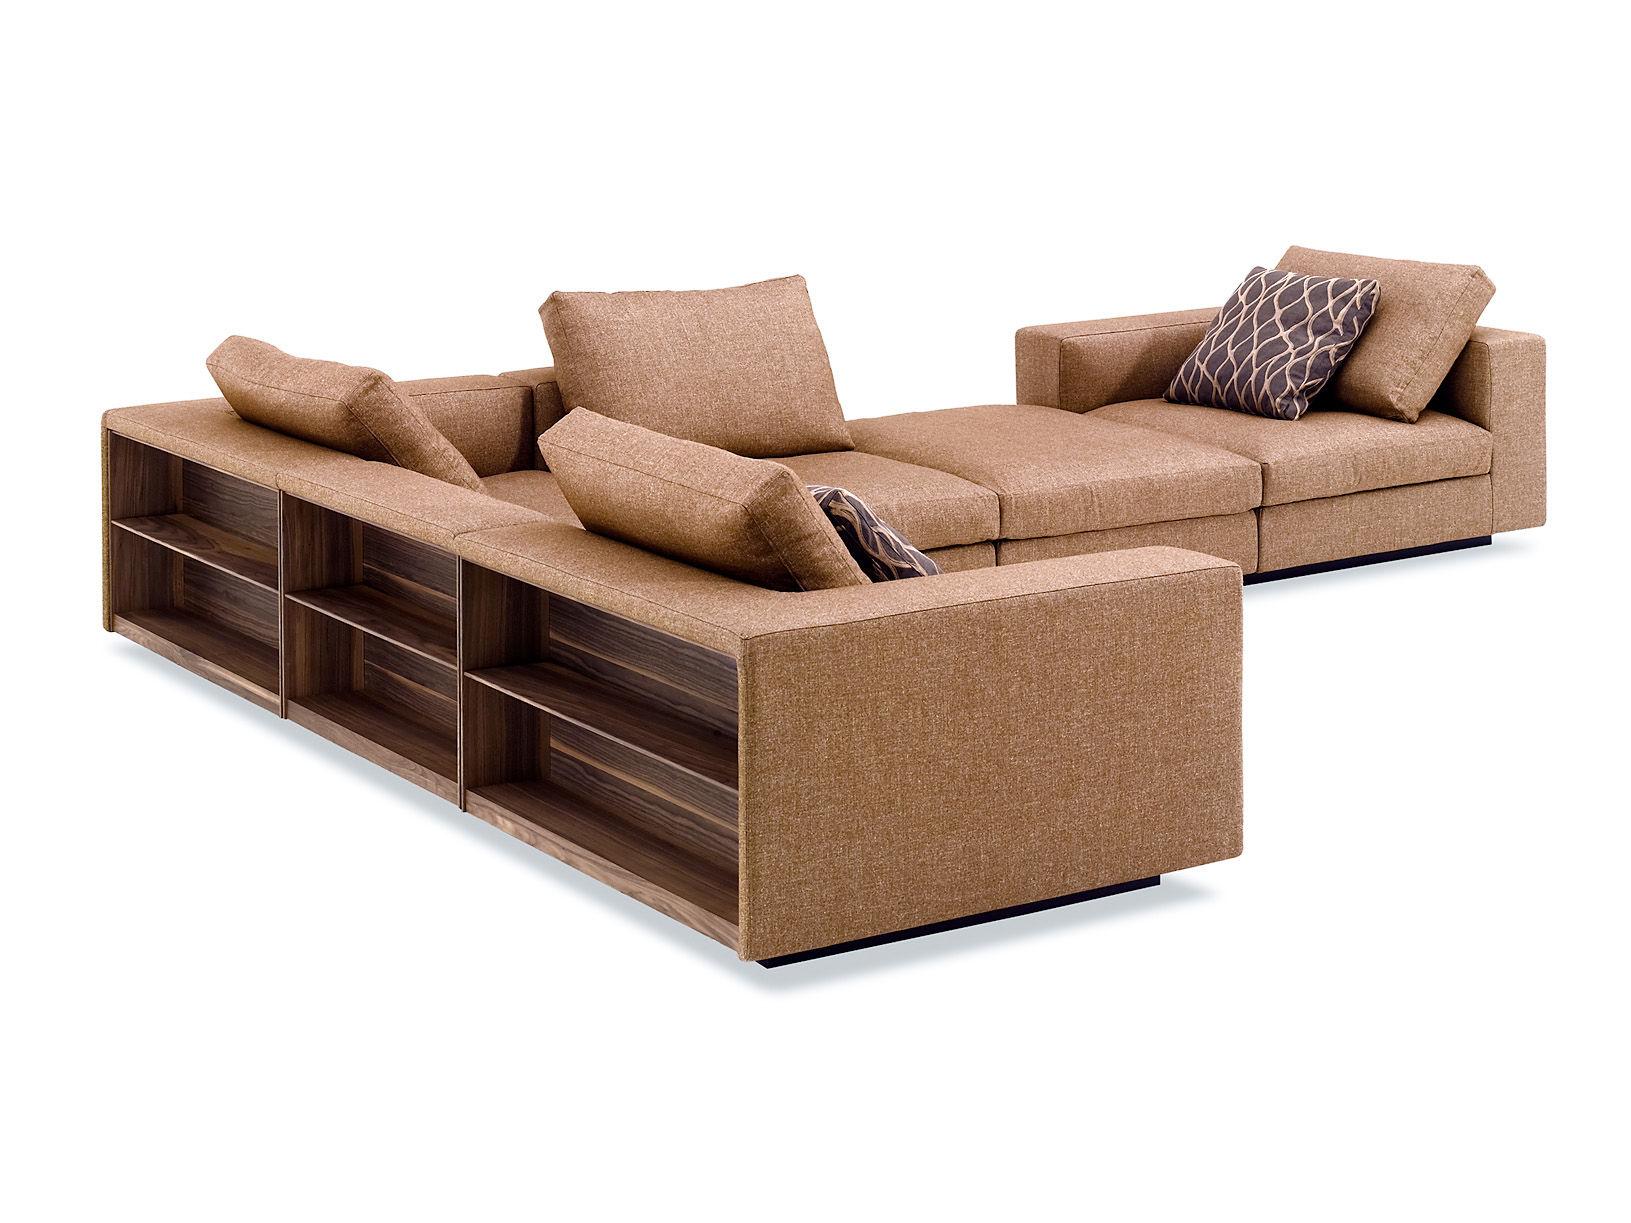 sofa mit boxen homeandgarden page 811 homeandgarden page 879 homeandgarden page 802 sofa mit. Black Bedroom Furniture Sets. Home Design Ideas